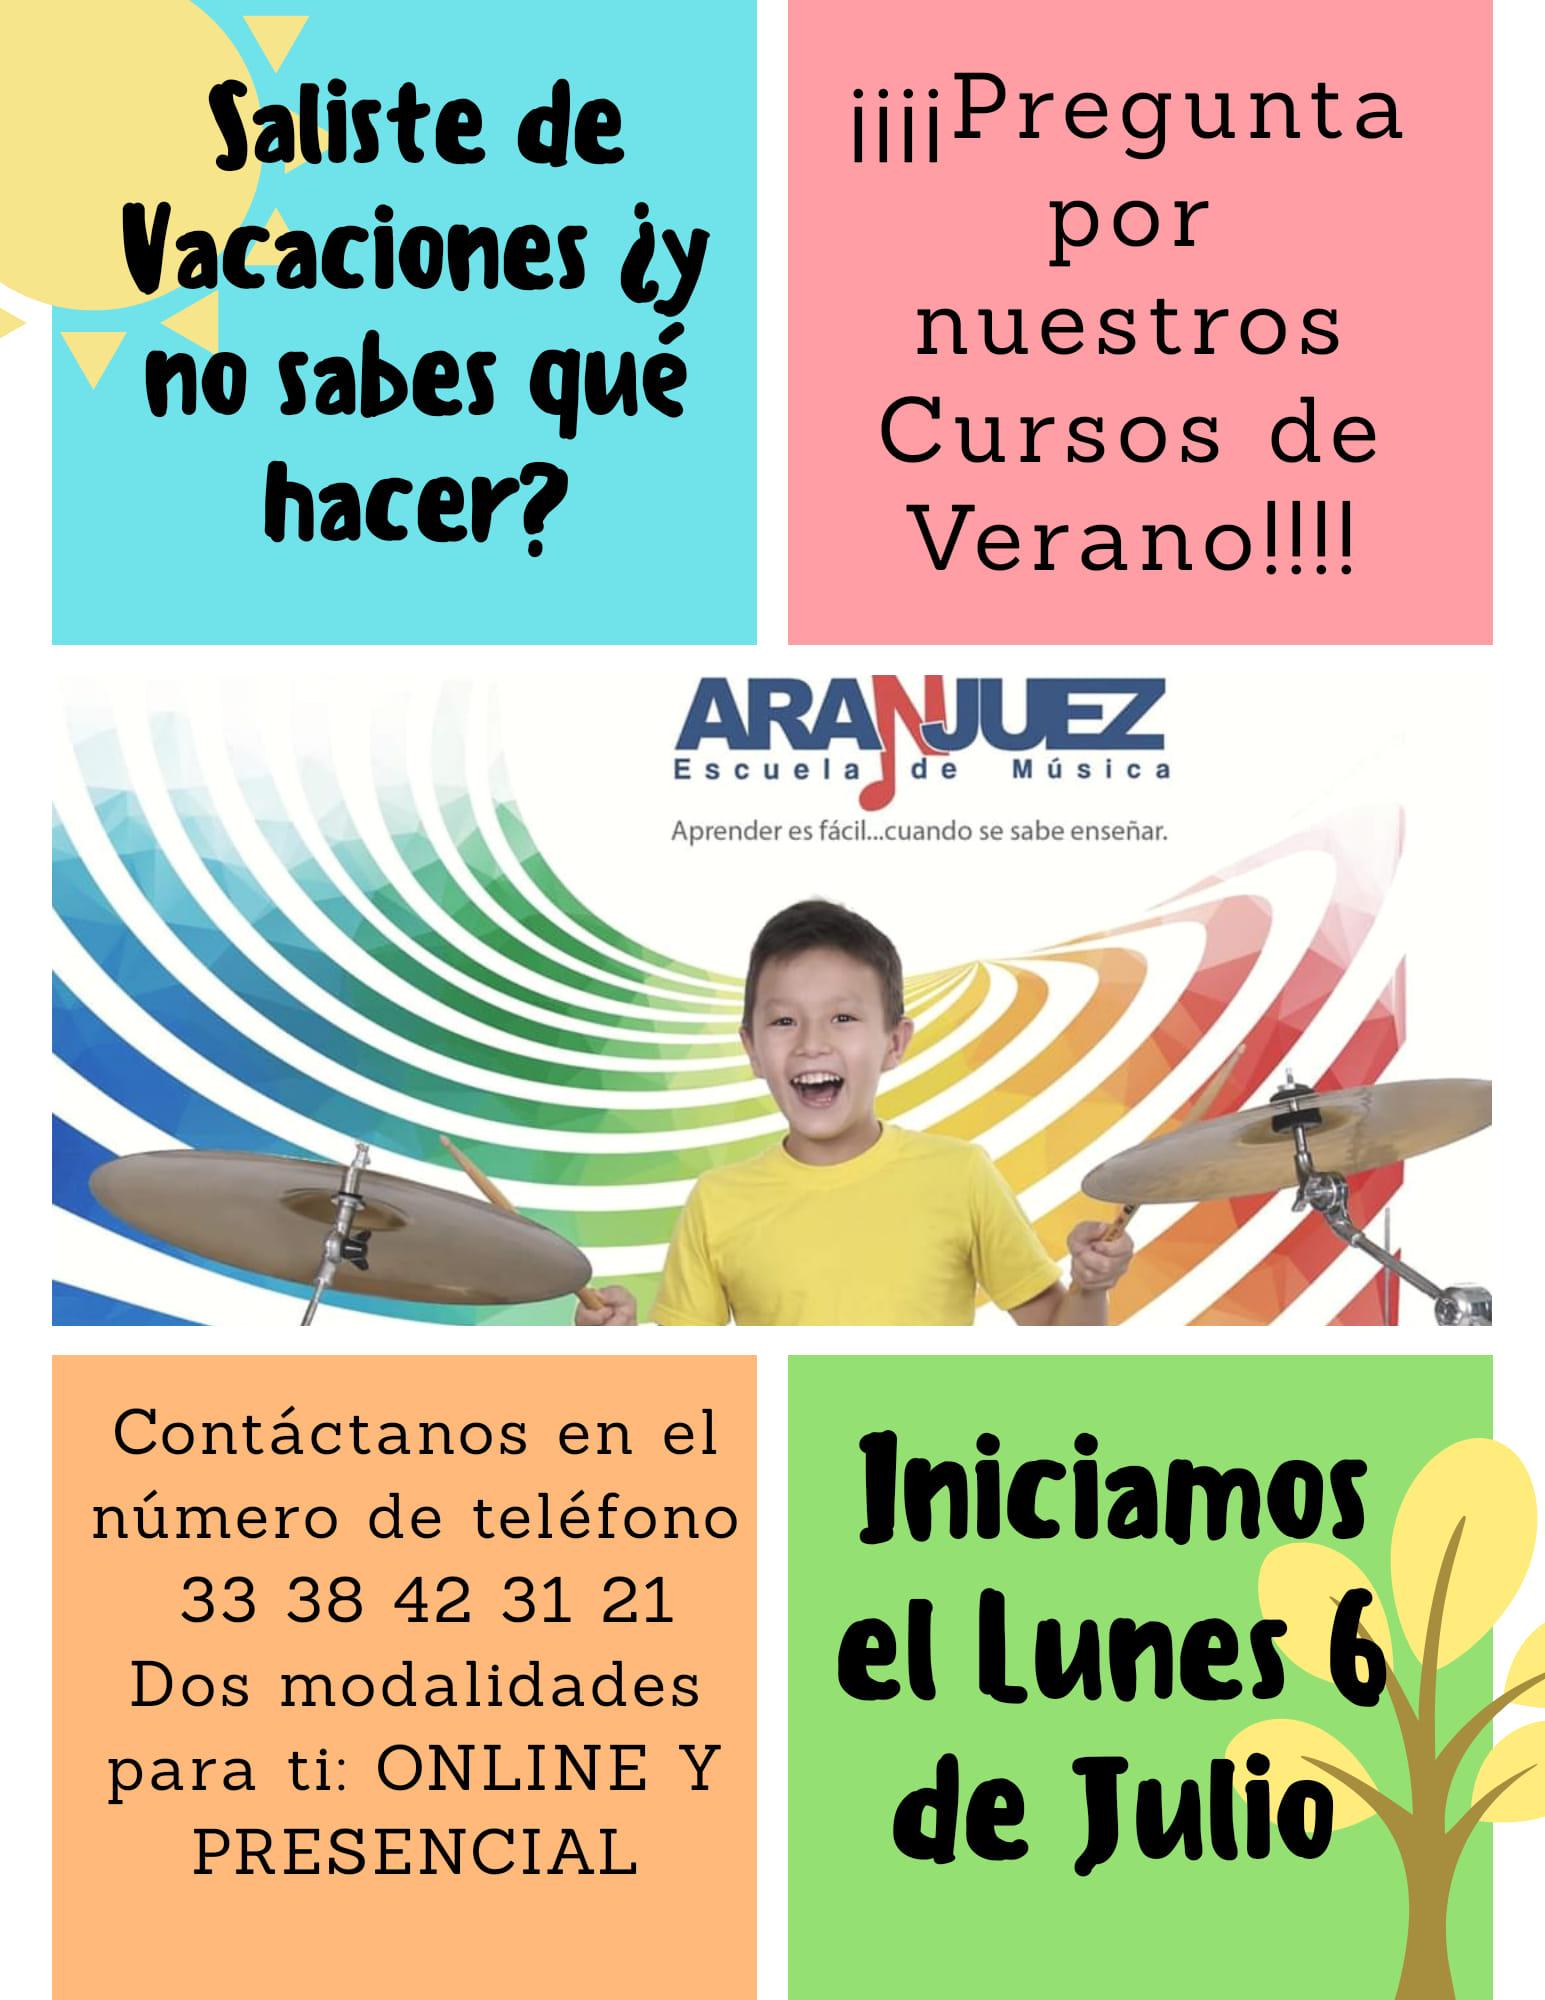 Academia de música Aranjuez